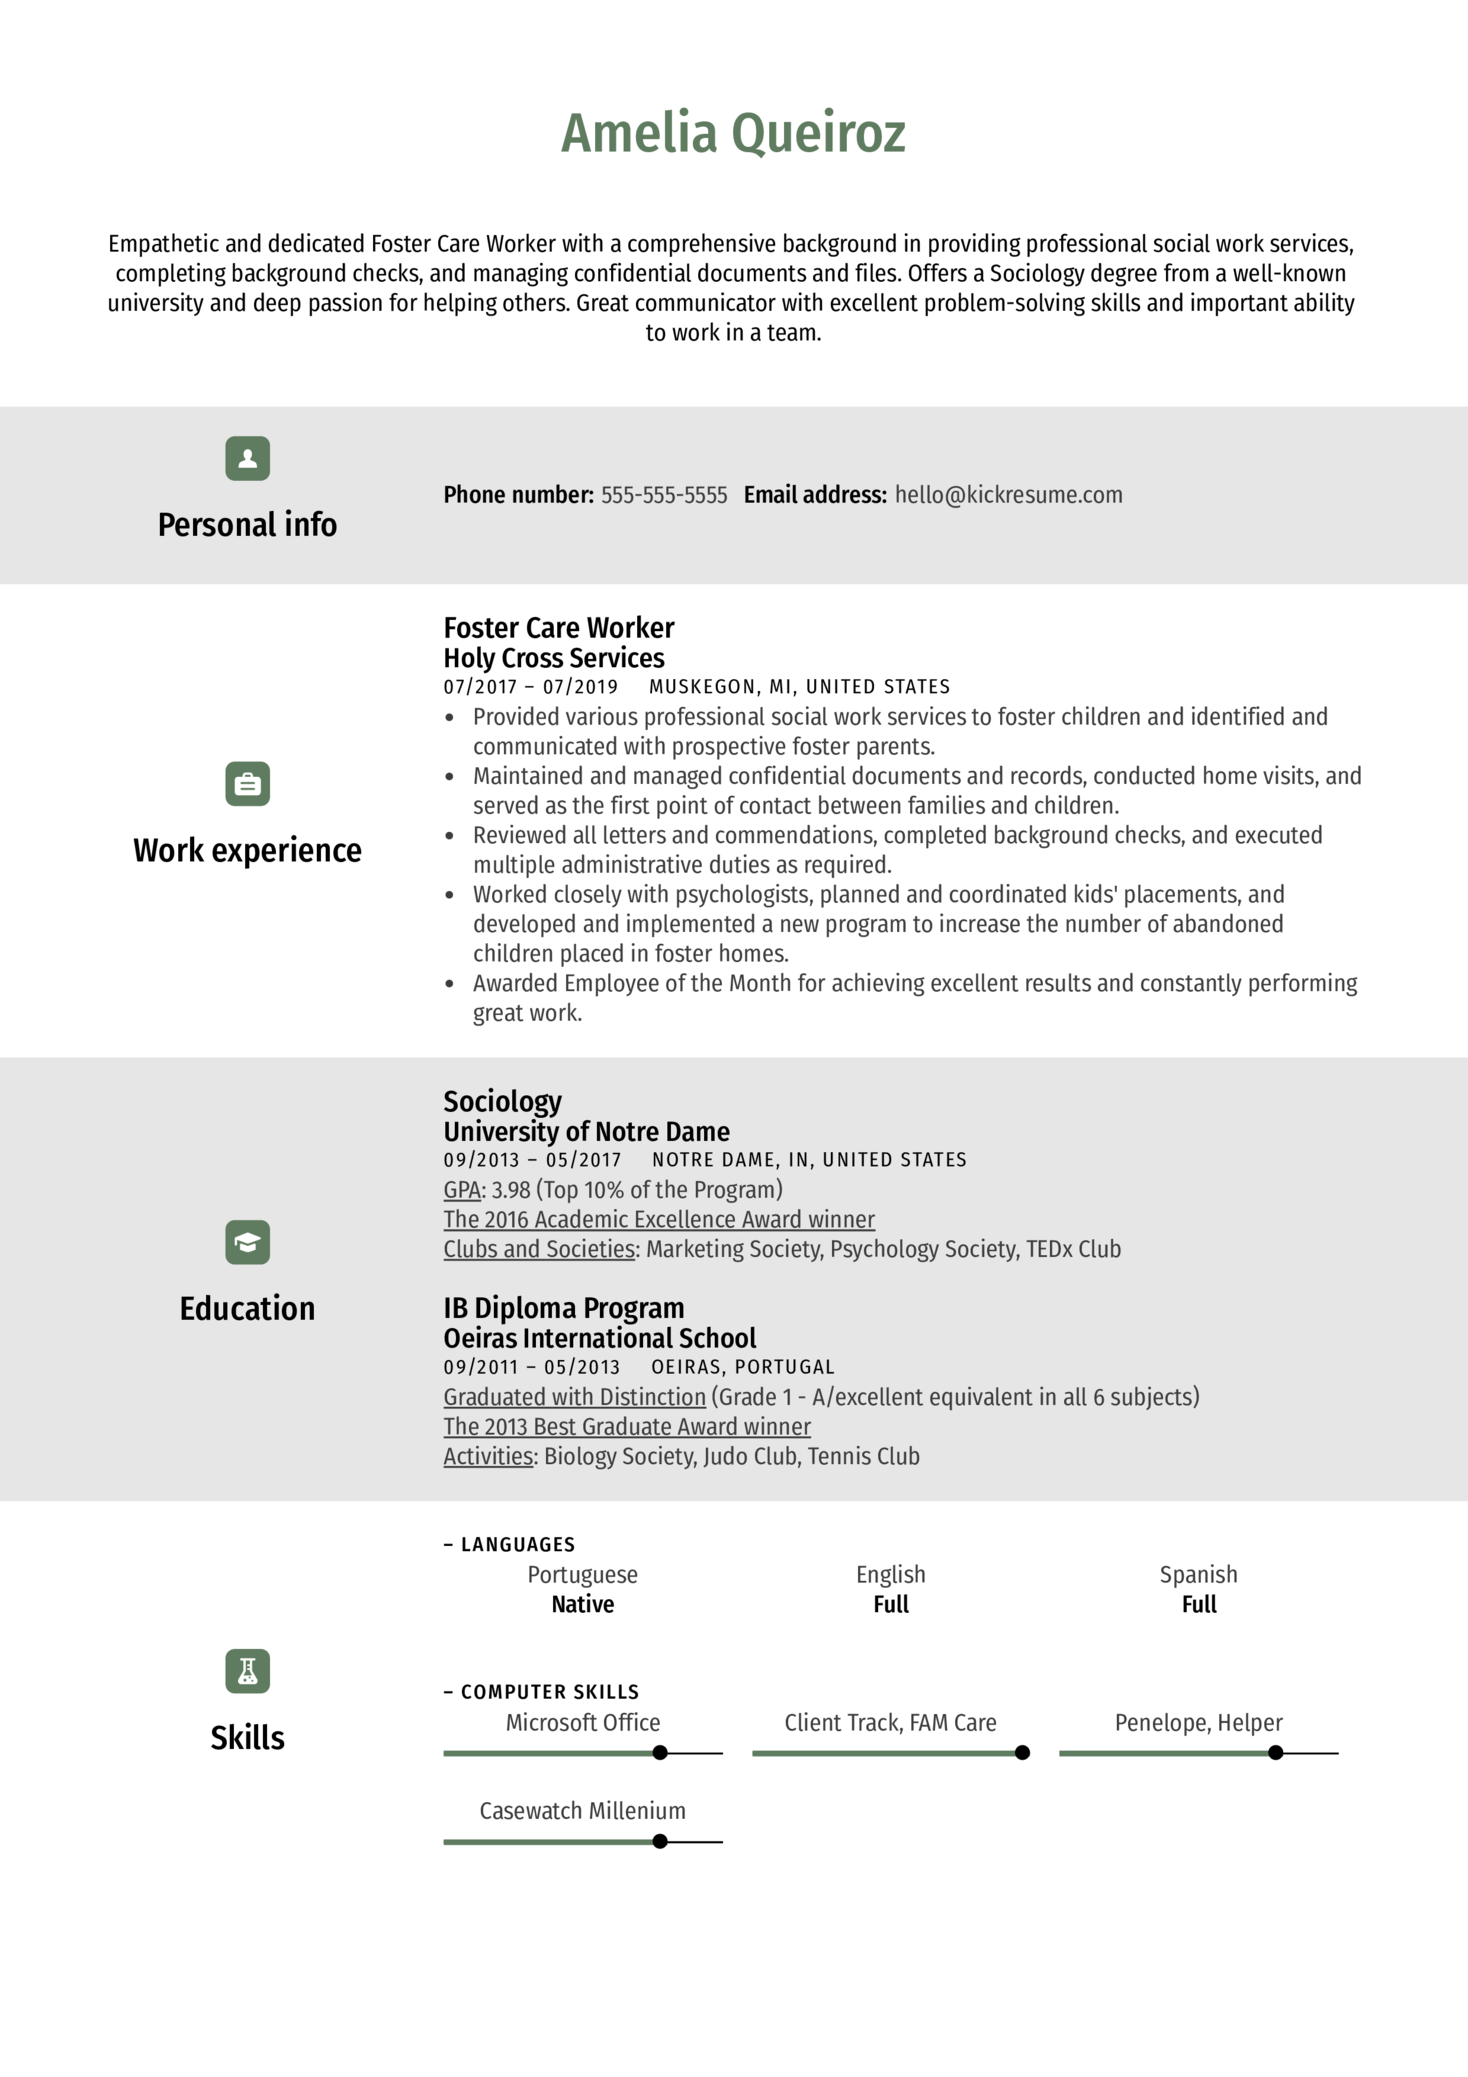 Foster Care Worker Resume Example (časť 1)